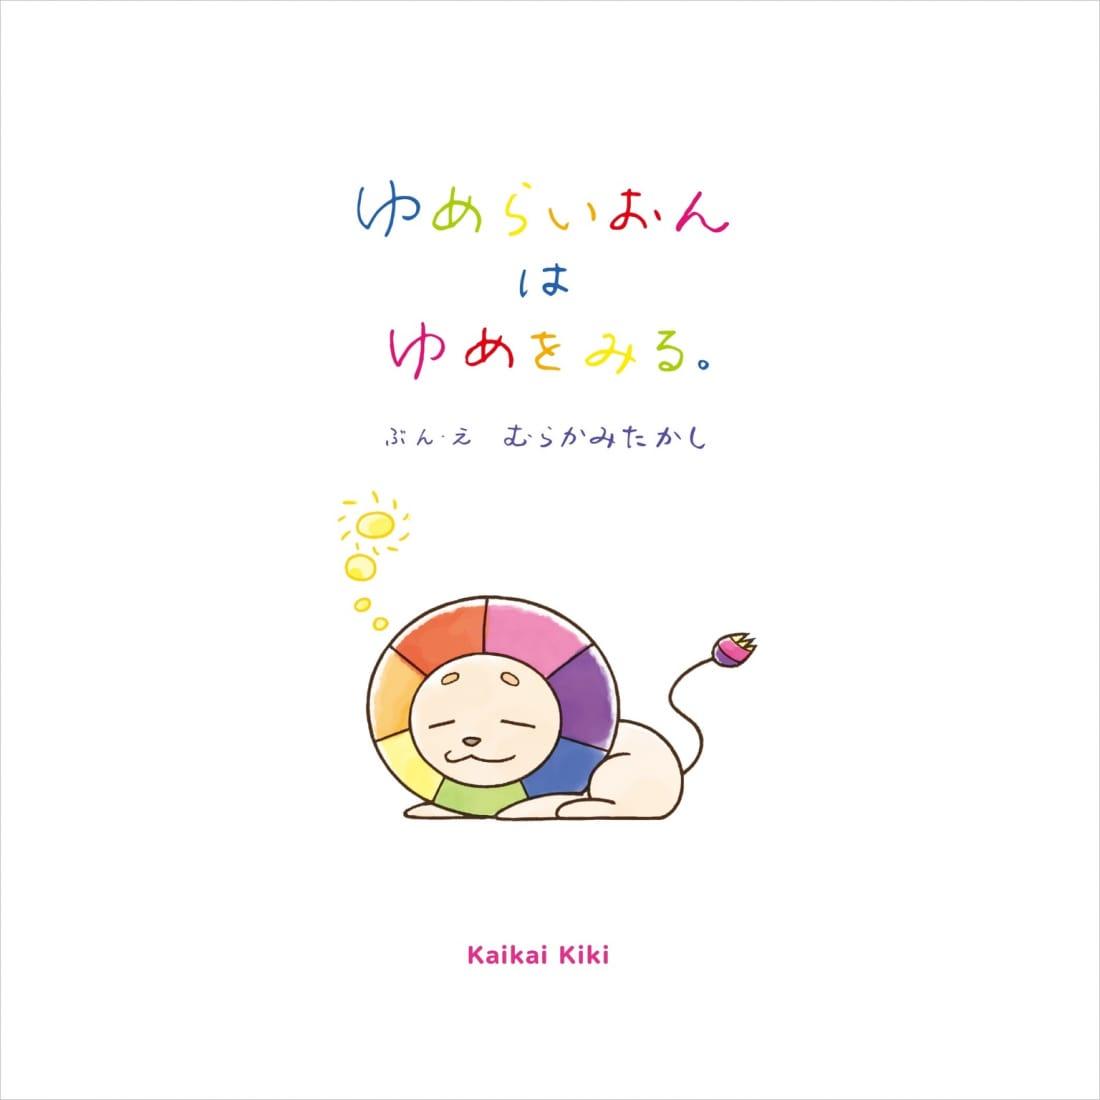 Yume Lion Dreams Takashi Murakami cover